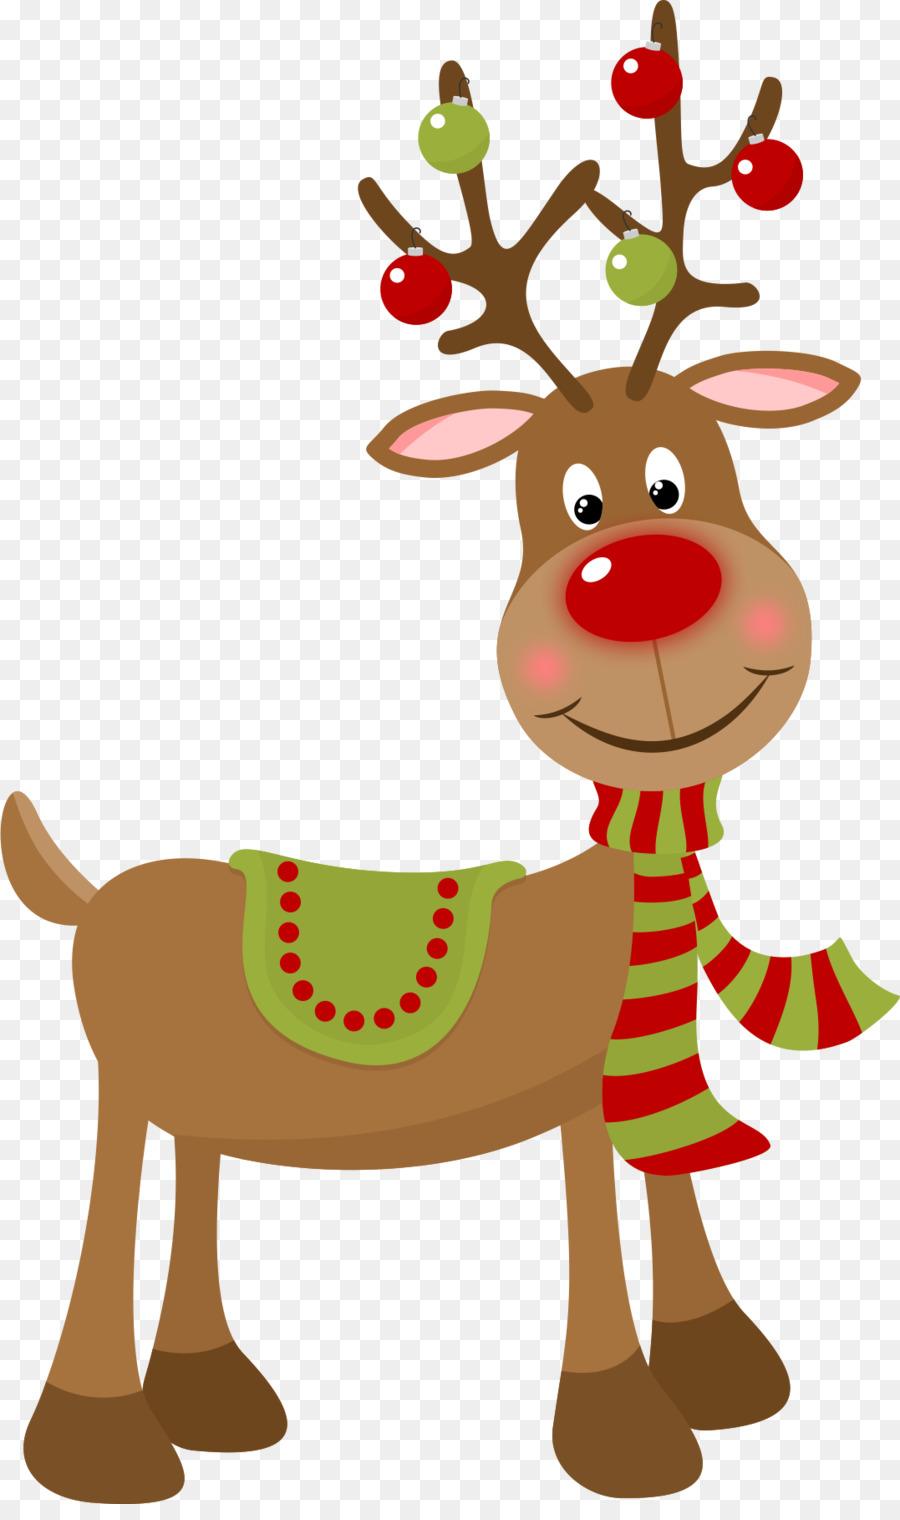 Christmas Tree Art clipart - Deer, Christmas, Tree ... clip library stock